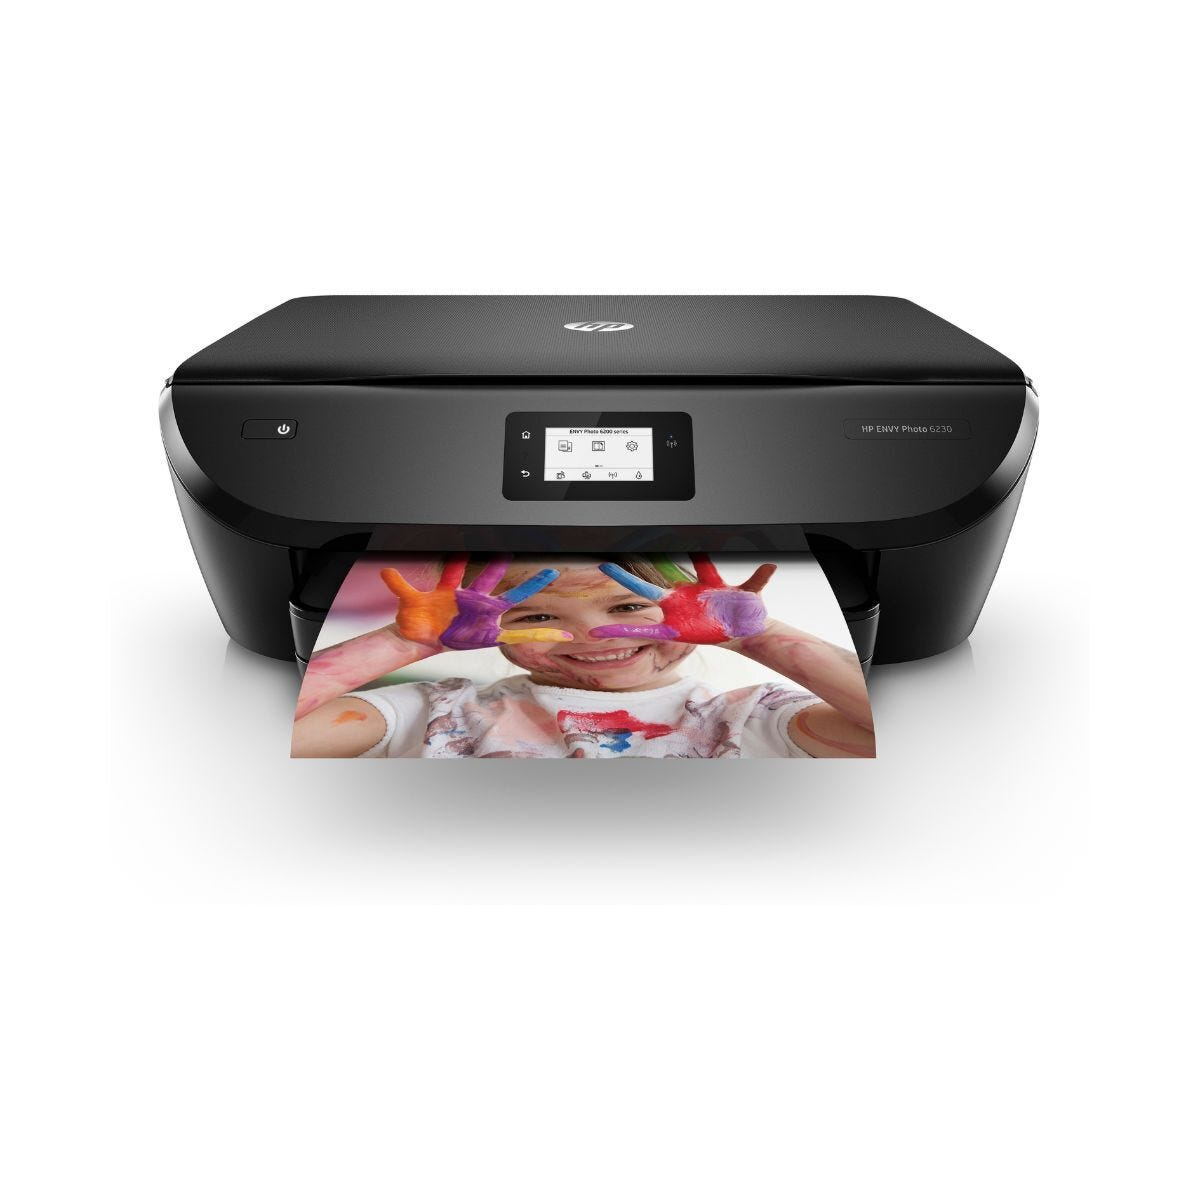 HP Envy 6230 All in One Wireless Inkjet Printer